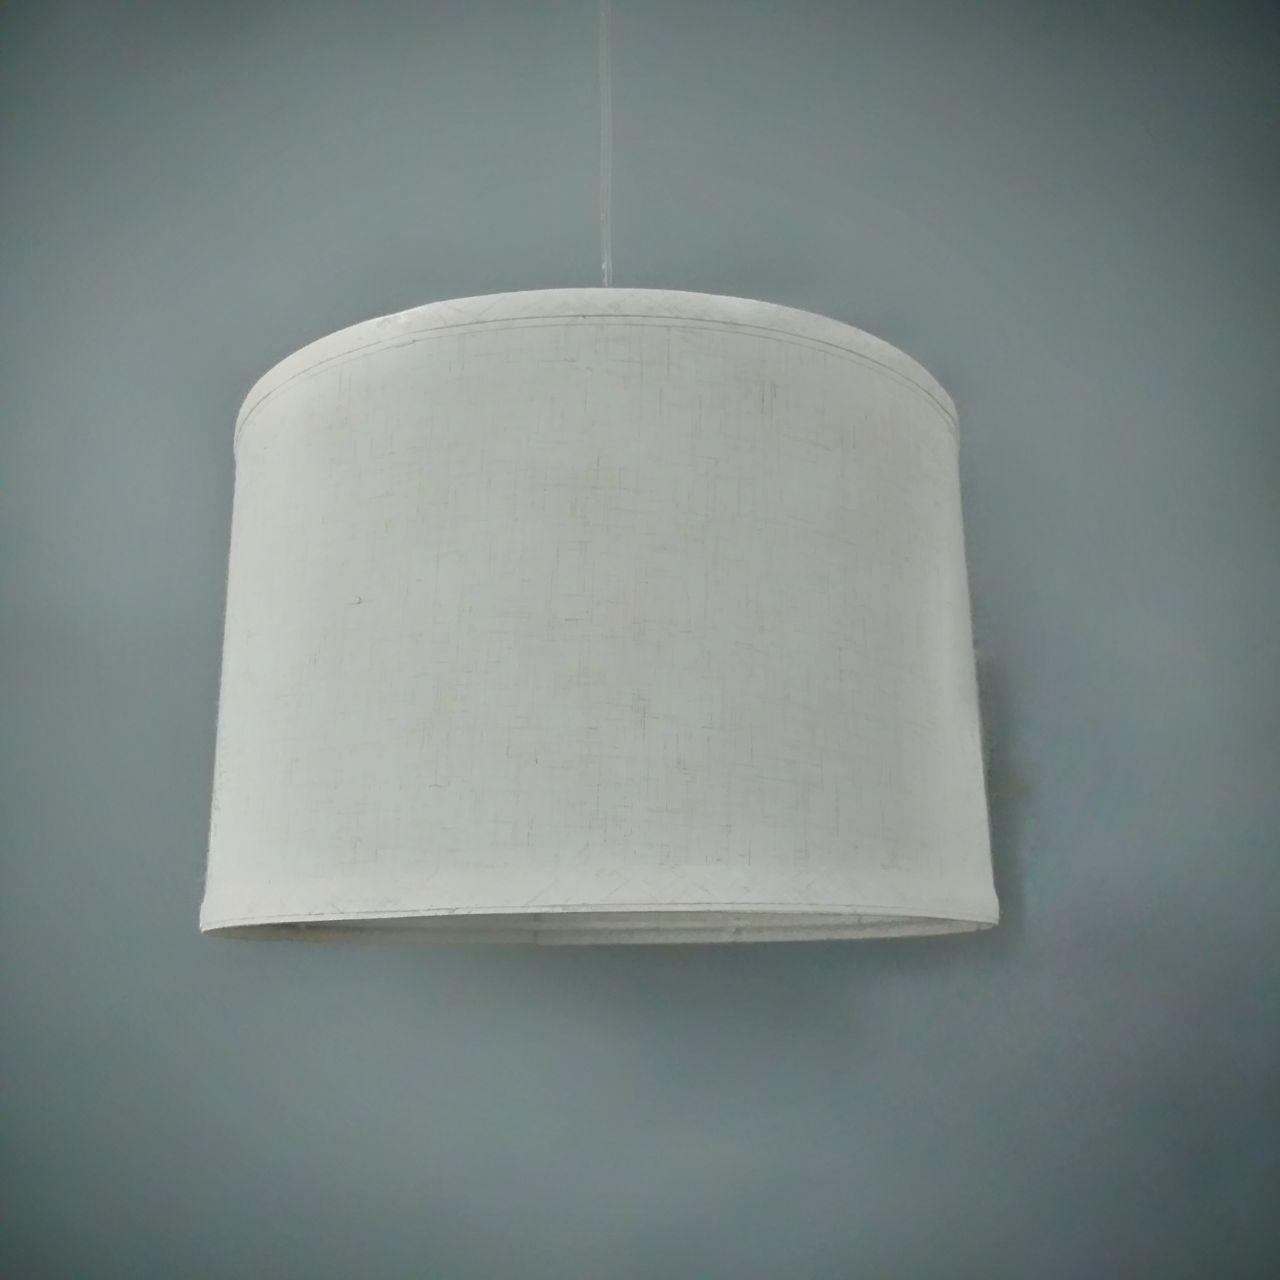 Люстра подвесная на одну лампу P4504 Бежевый(30cm) ТК